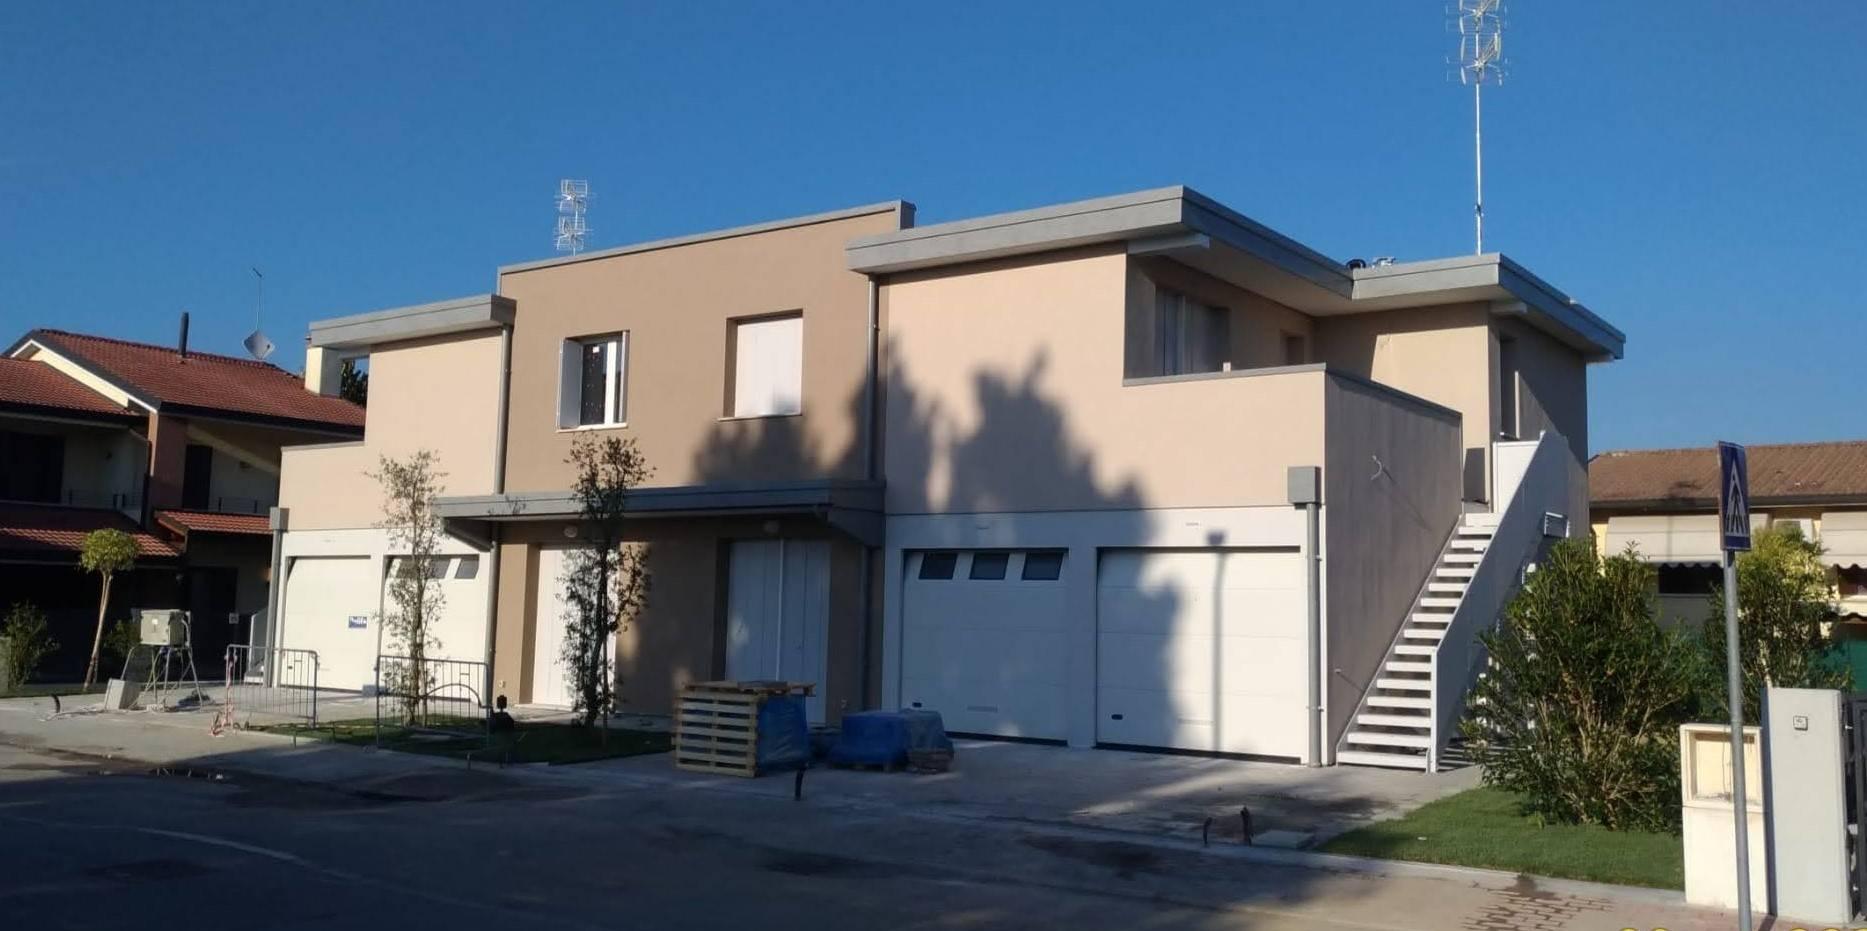 Appartamento indipendenteaQUINTO DI TREVISO